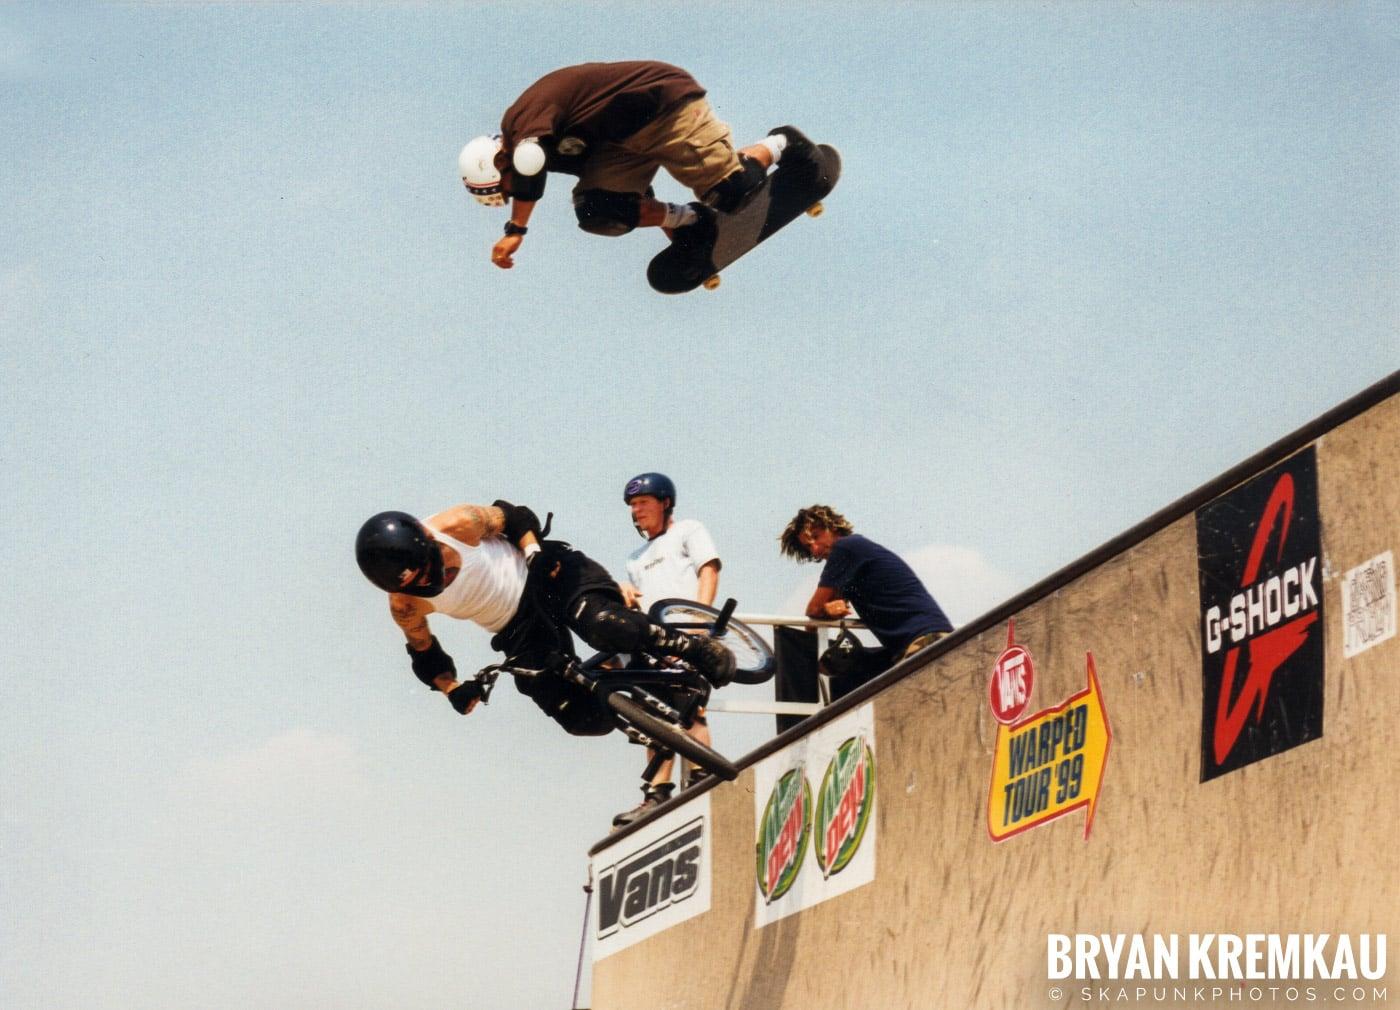 Skaters @ Vans Warped Tour, Randall's Island, NYC - 7.16.99 (4)